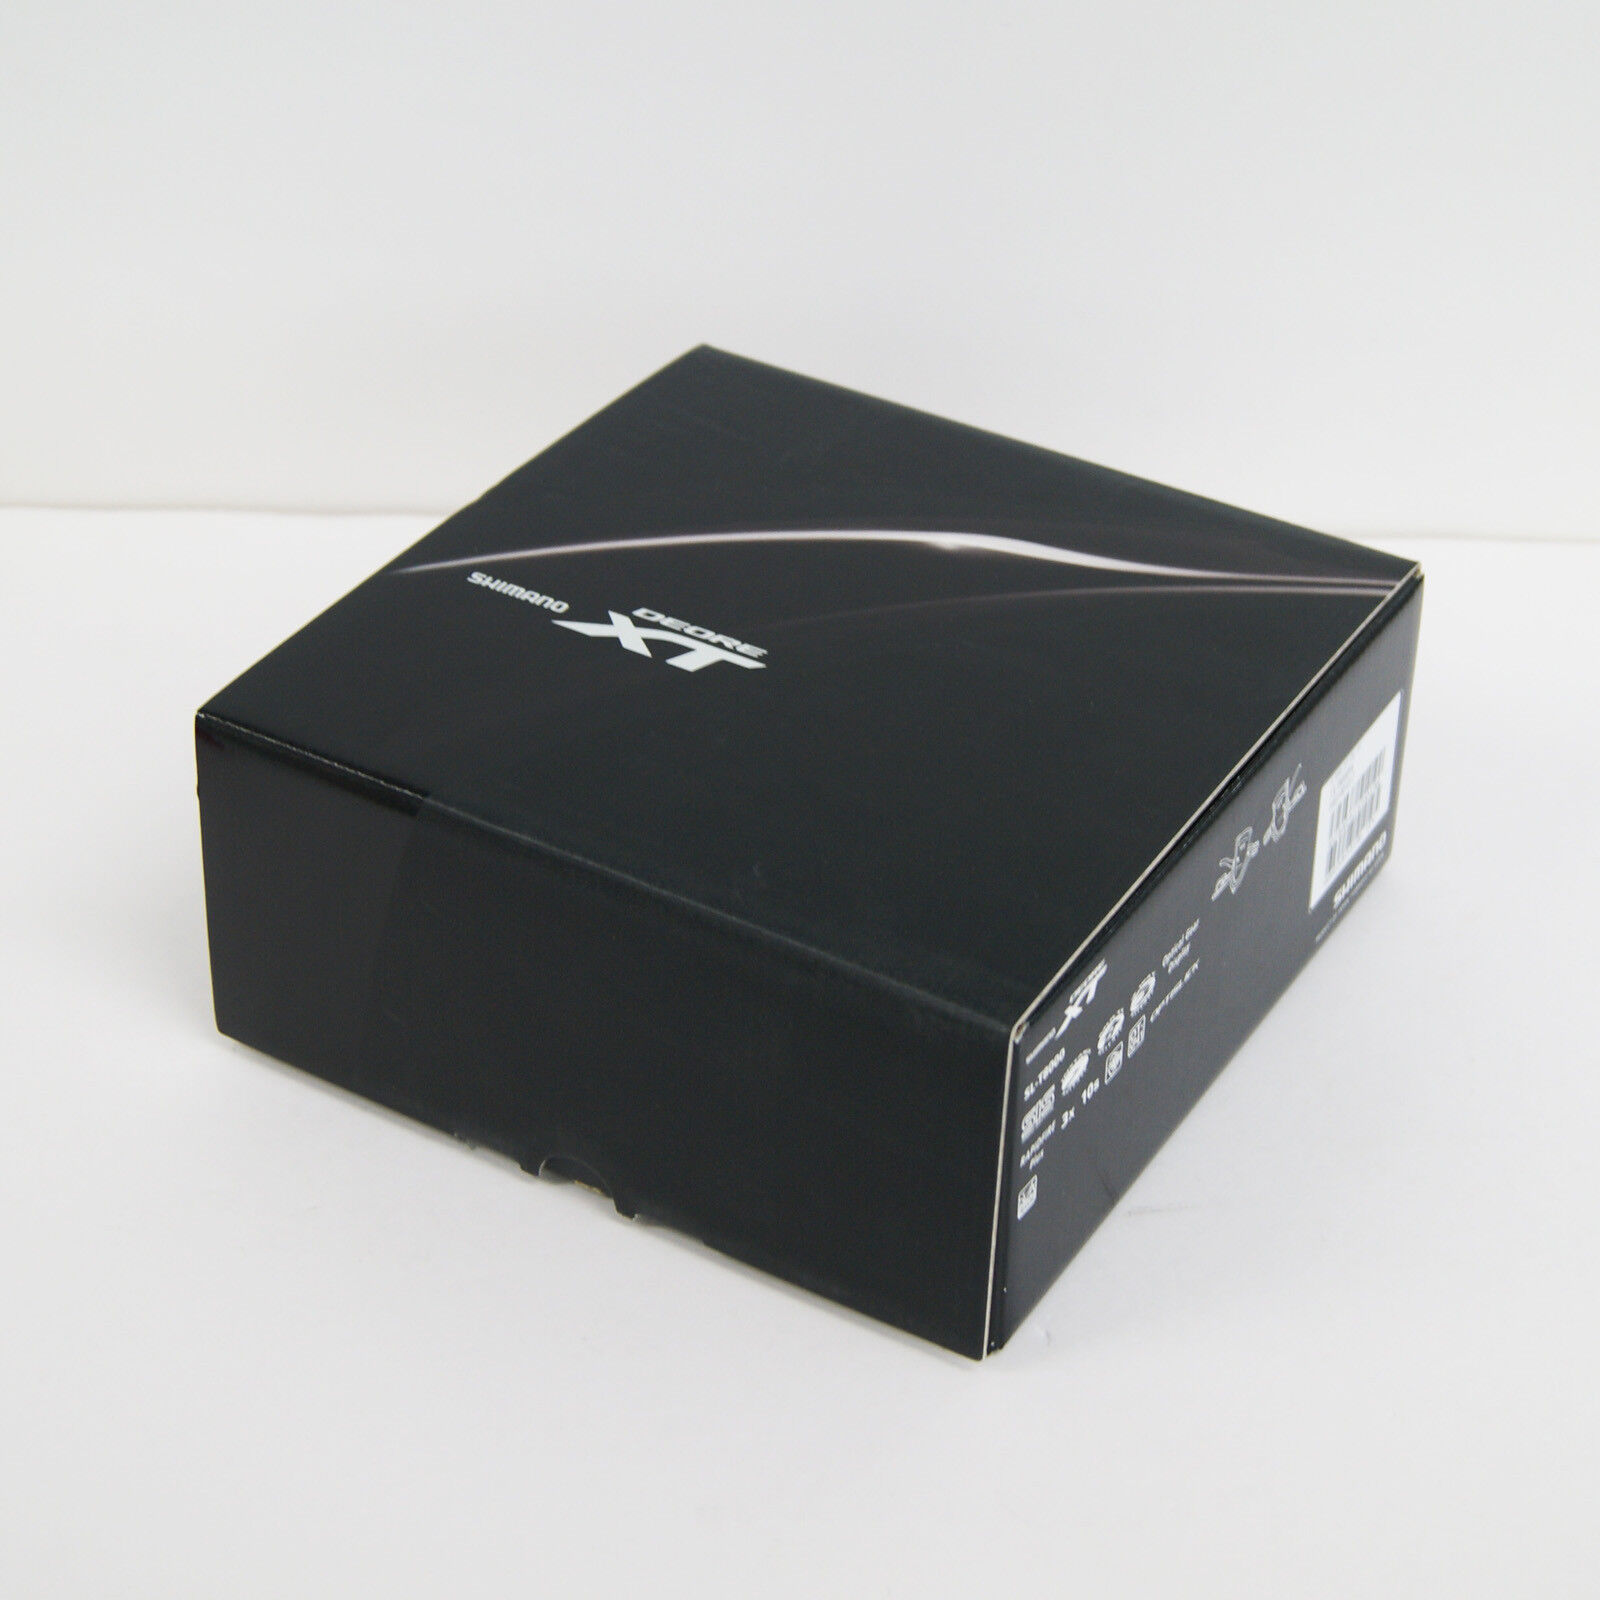 Shimano DEORE XT SL-T8000 3X10 Rapidfire Plus Shift Levers (Pair) ISLT8000PA